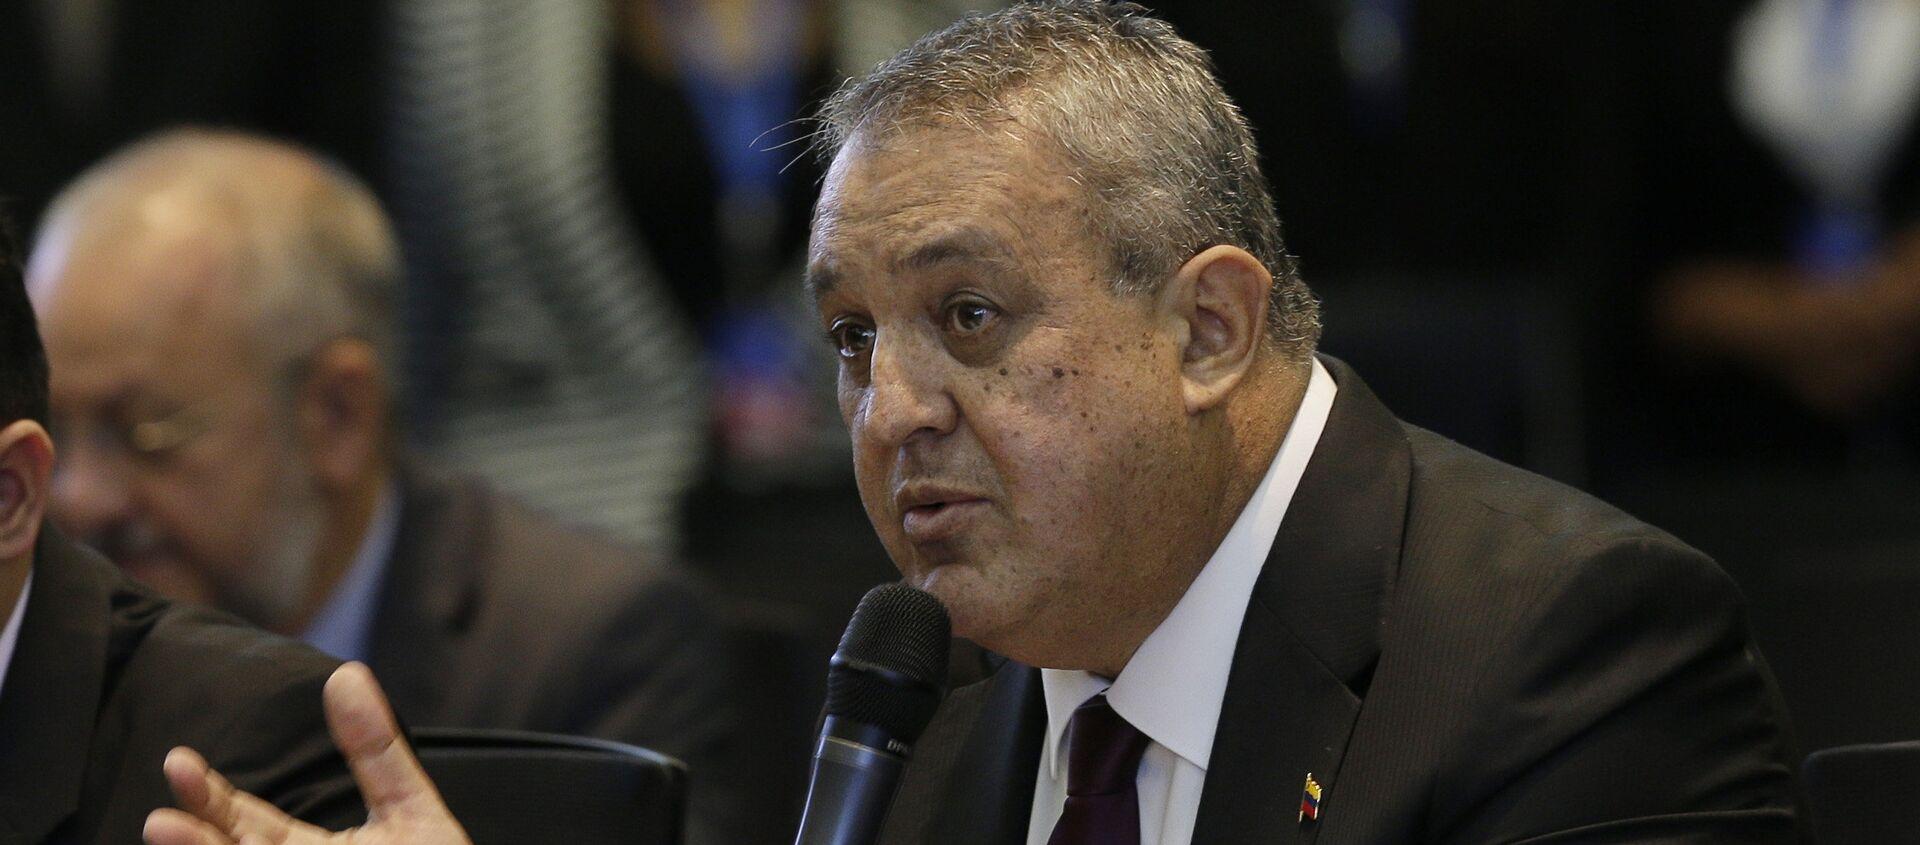 Venezuela's Oil Minister Eulogio del Pino adresses oil ministers and delegates from Colombia and Ecuador regarding the next OPEC meeting - Sputnik Mundo, 1920, 09.02.2021